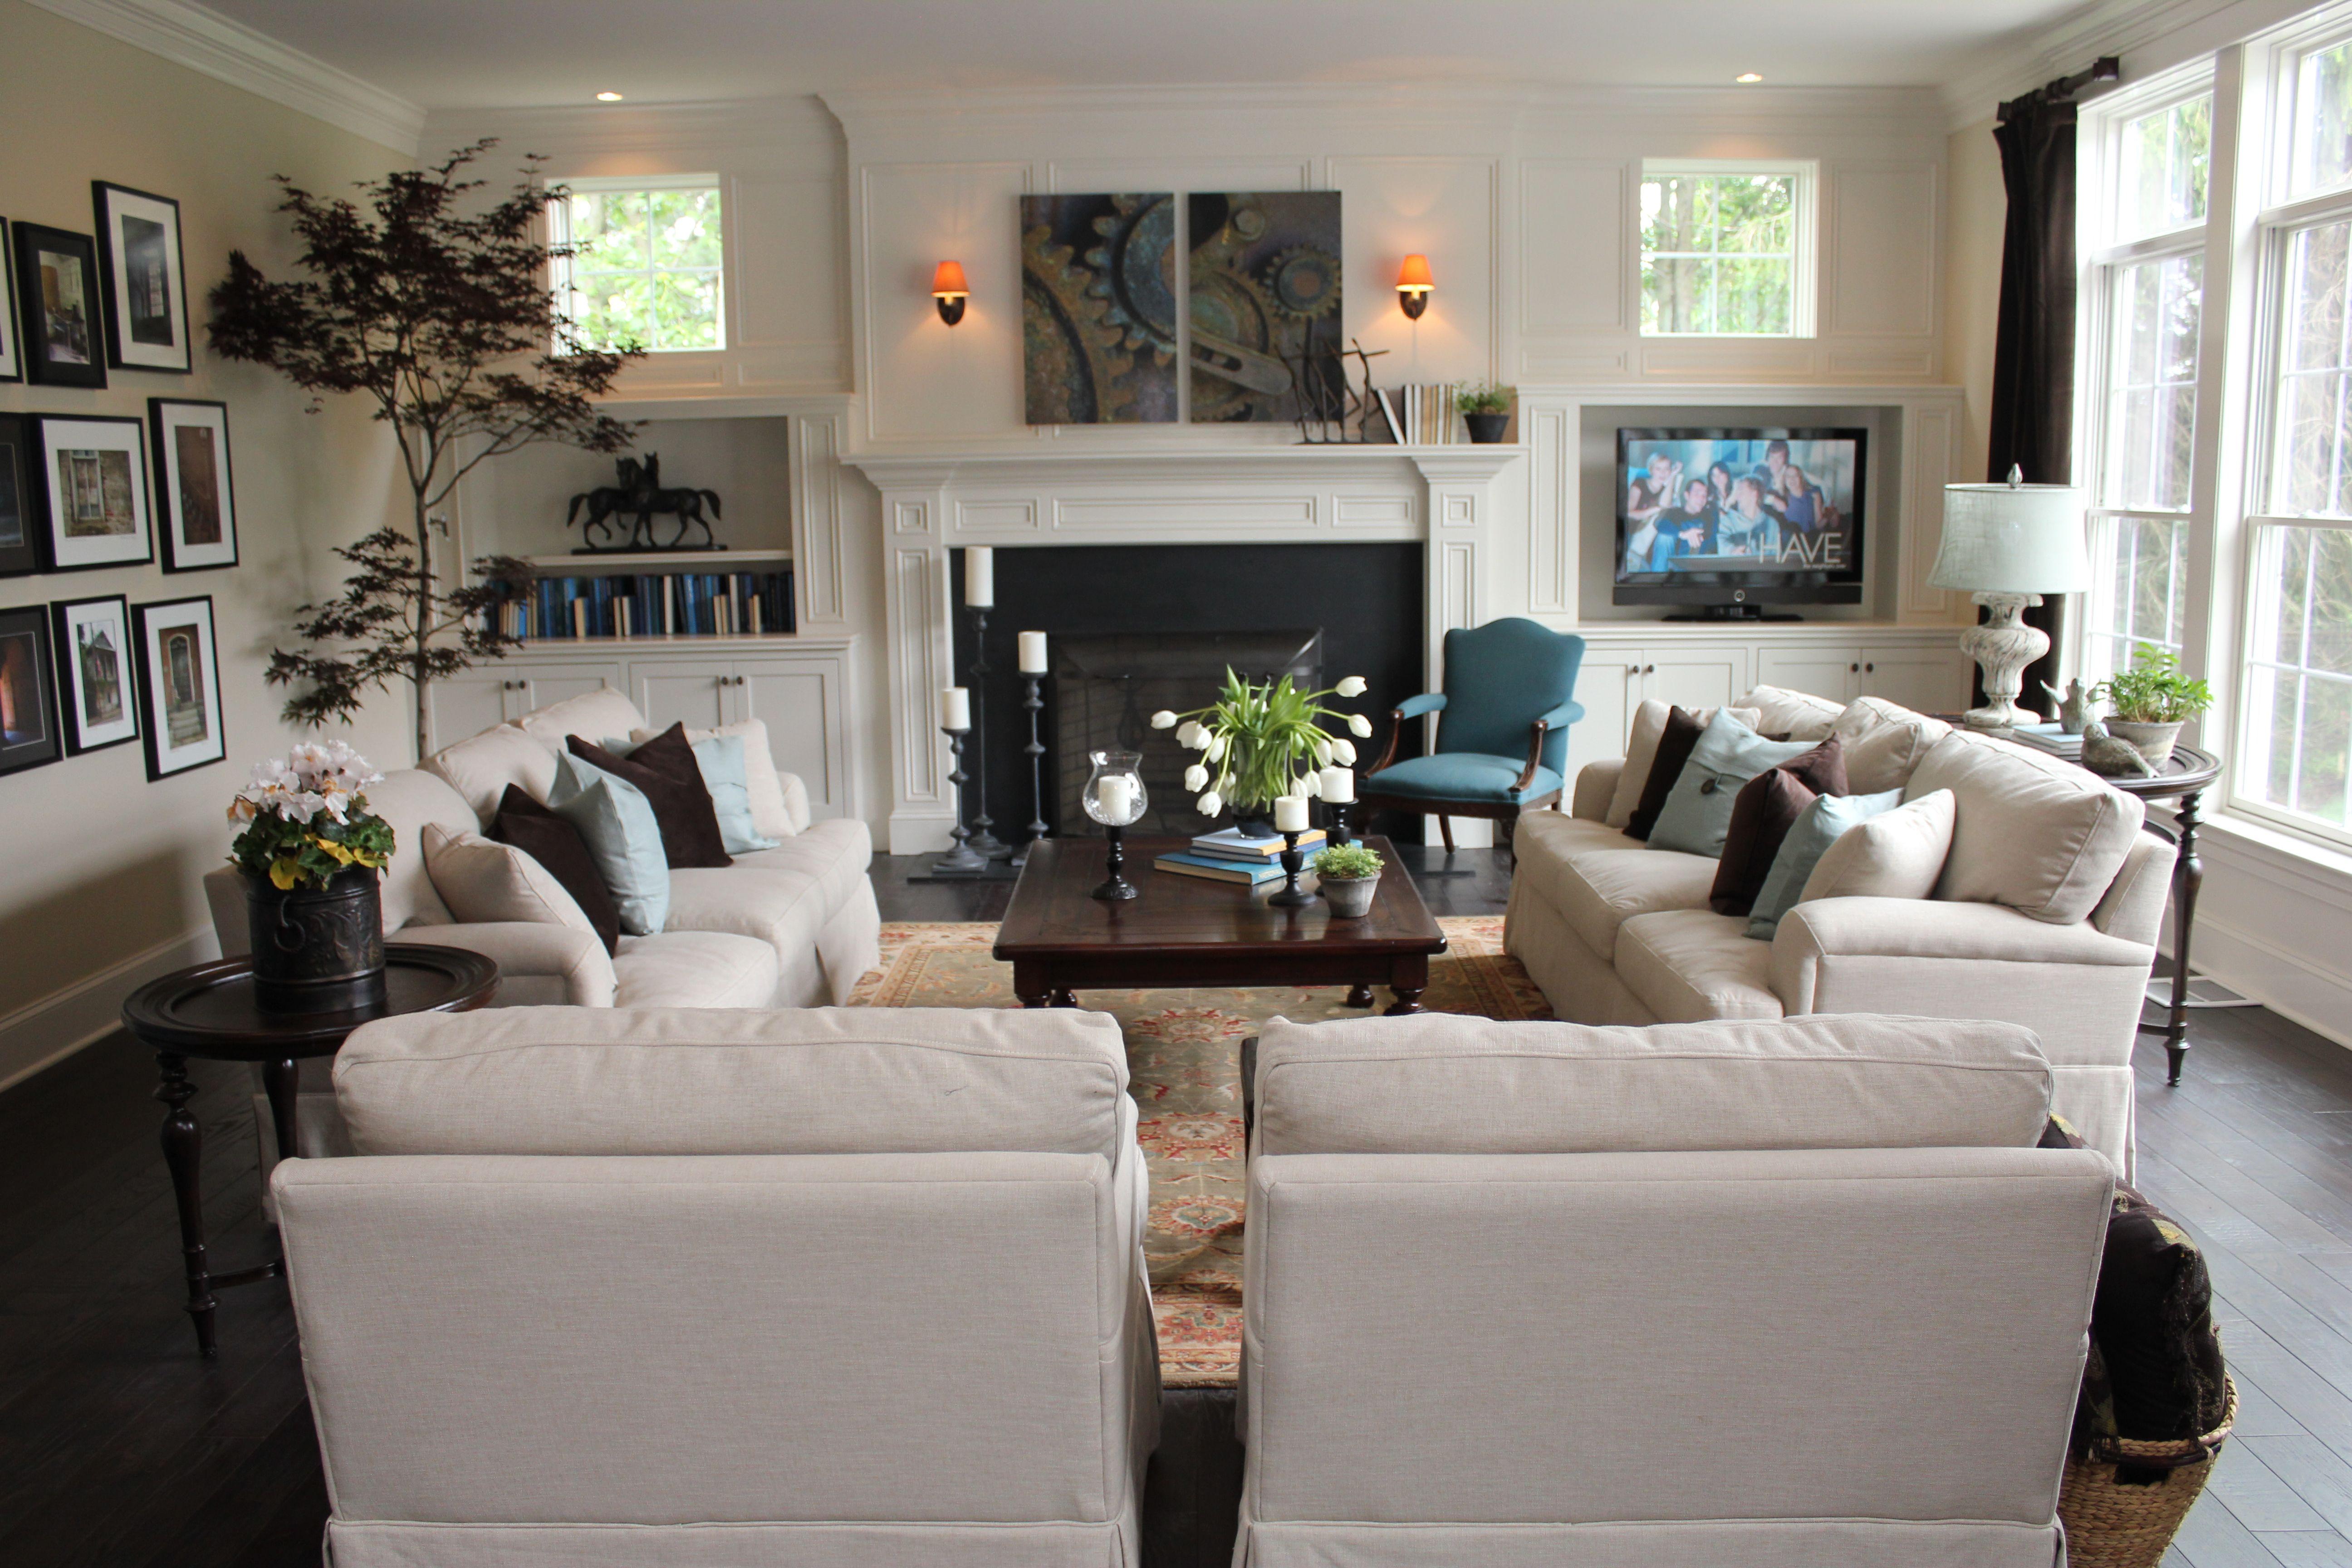 Image Result For How To Arrange Living Room Furniture In A Rectangular Room